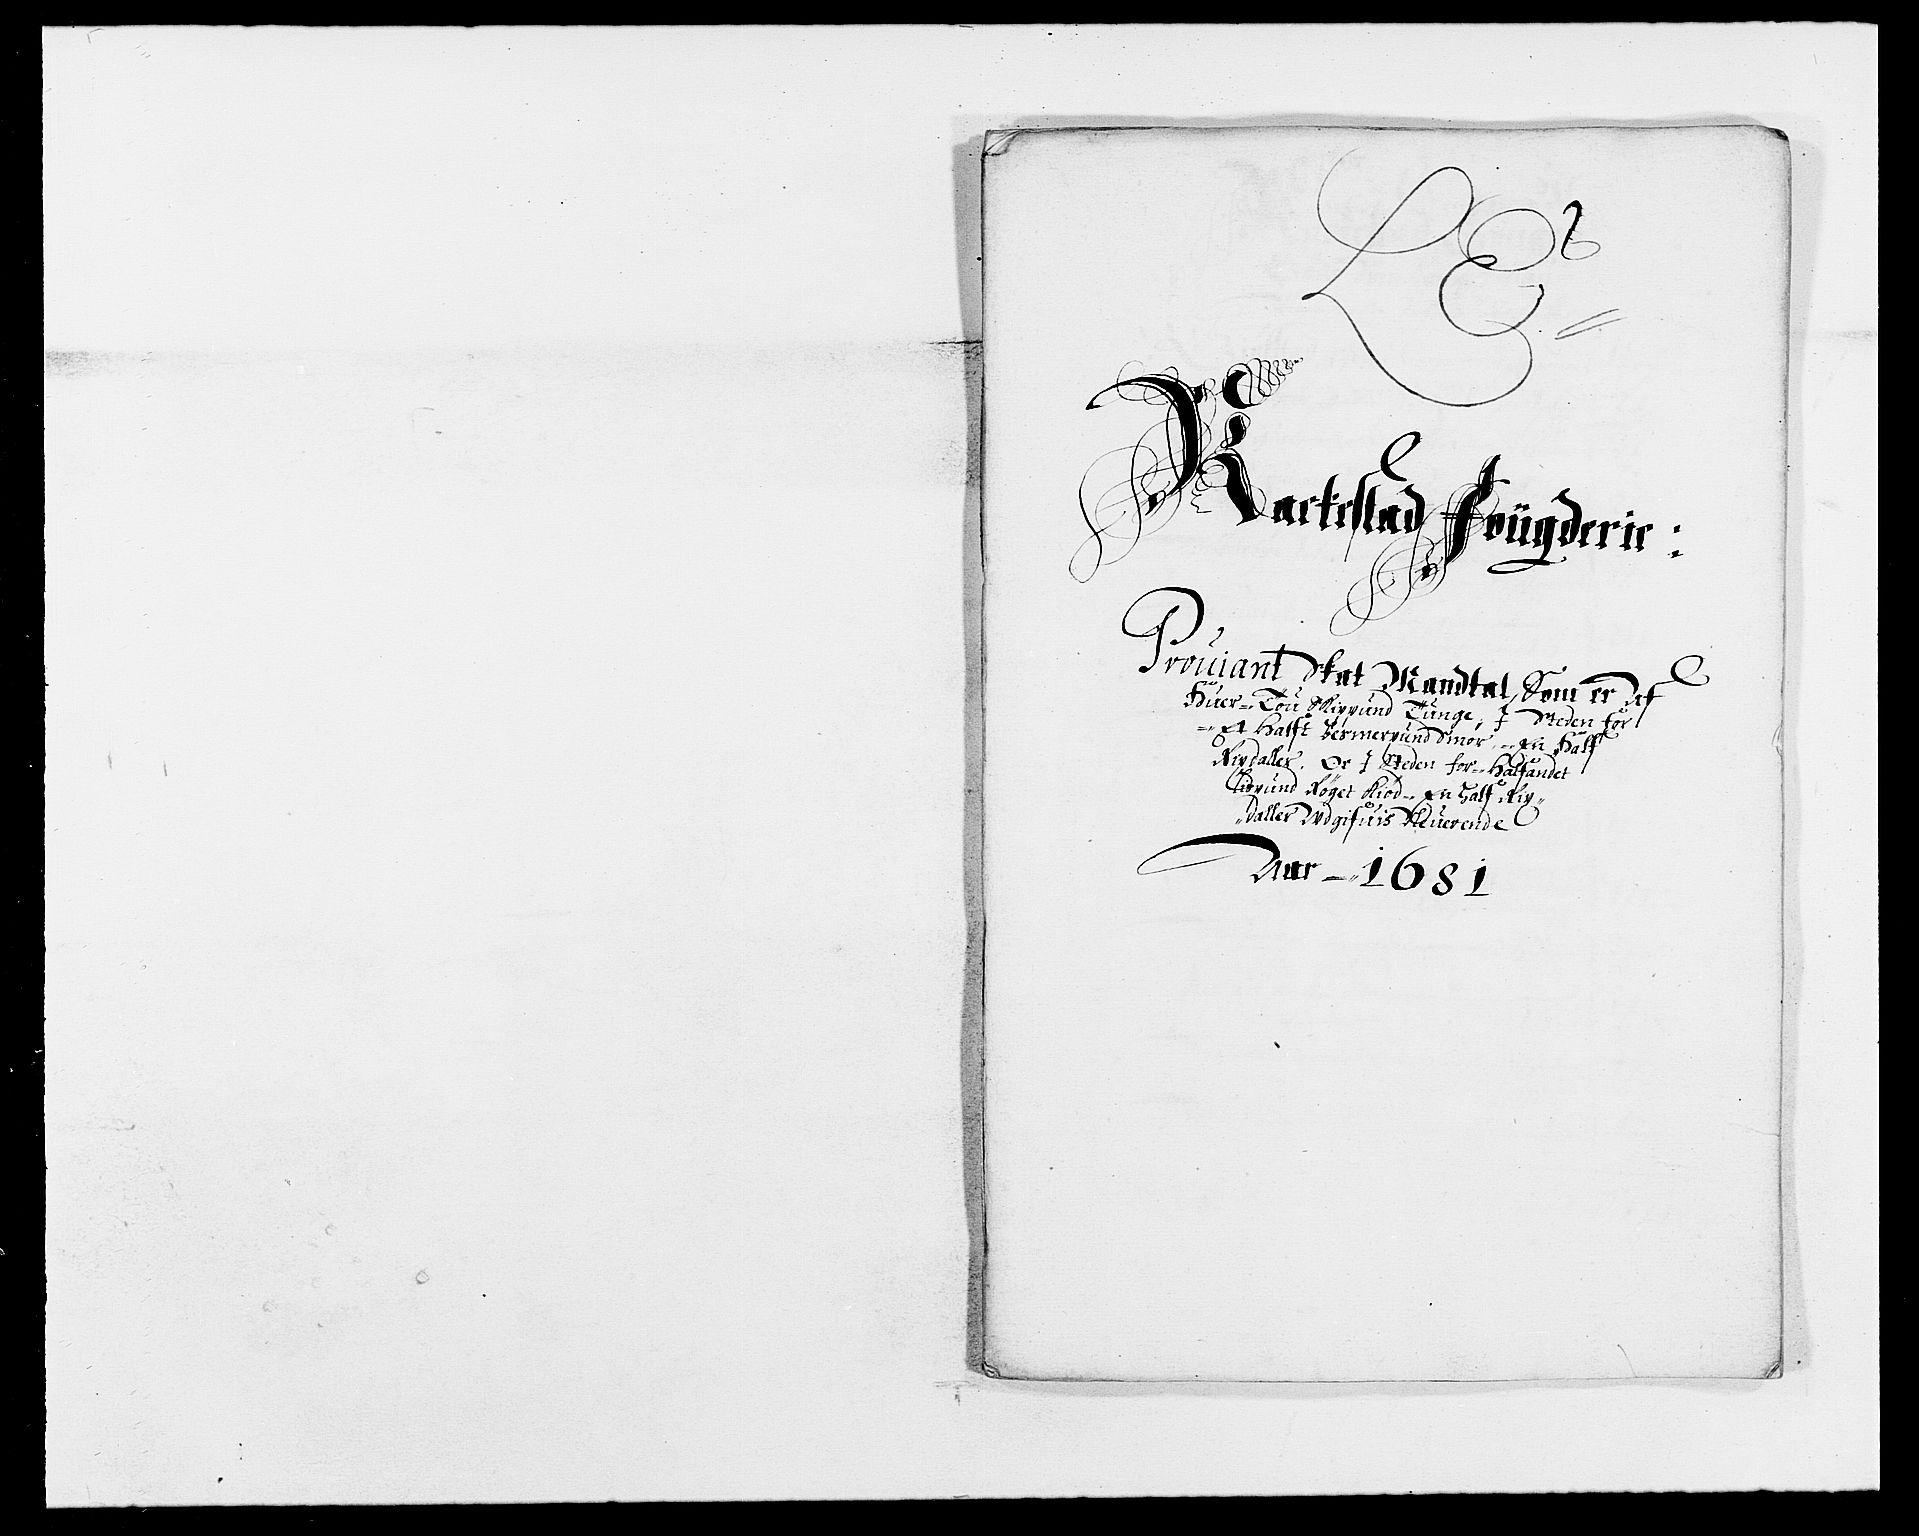 RA, Rentekammeret inntil 1814, Reviderte regnskaper, Fogderegnskap, R05/L0272: Fogderegnskap Rakkestad, 1680-1681, s. 312